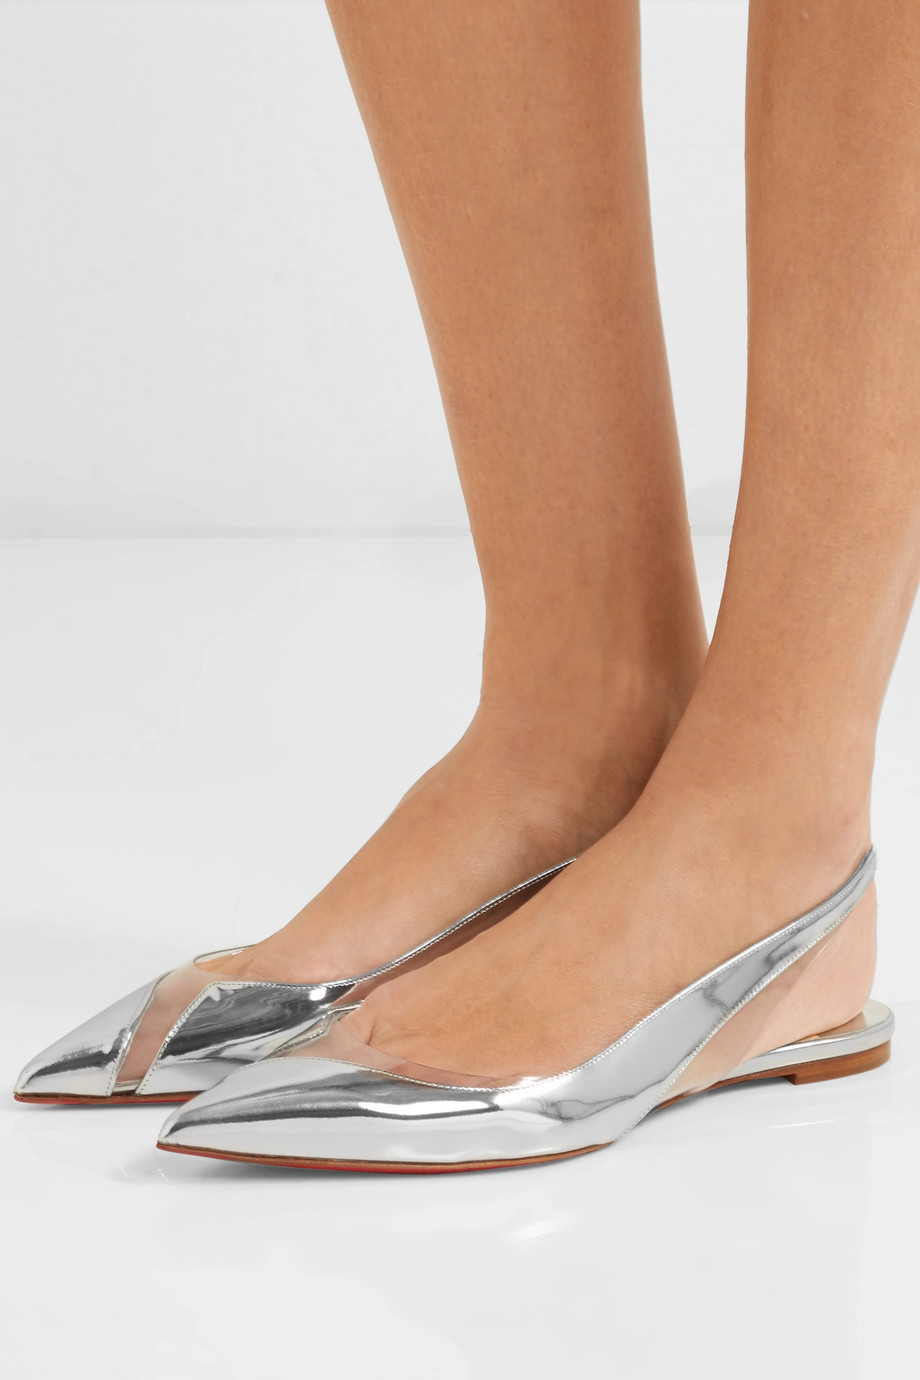 Christian Louboutin V Dec PVC and metallic leather slingback point-toe flats